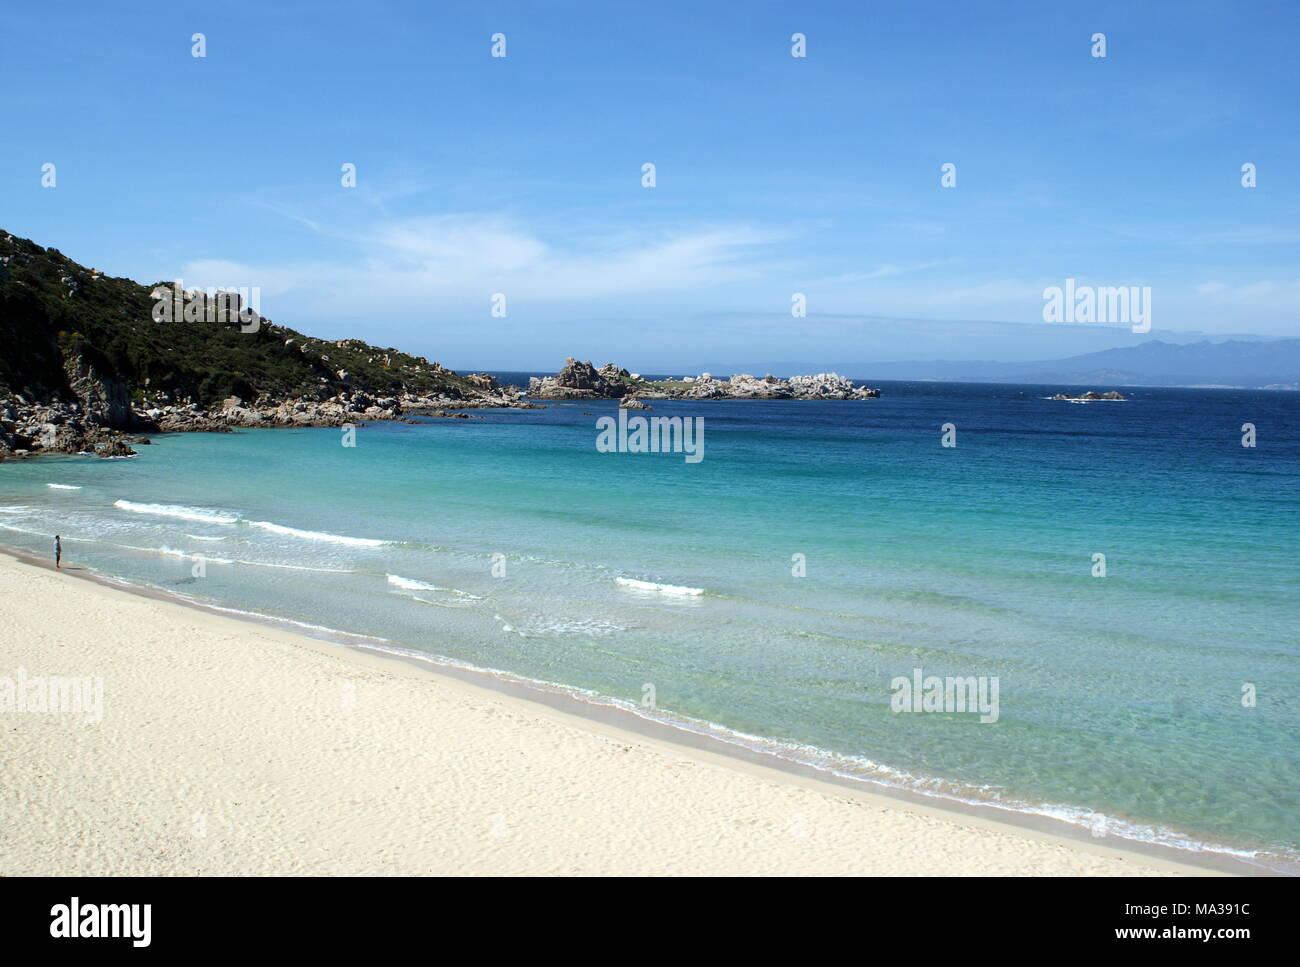 Rena Bianca beach, Santa Teresa Gallura, Sardinia, Italy - Stock Image